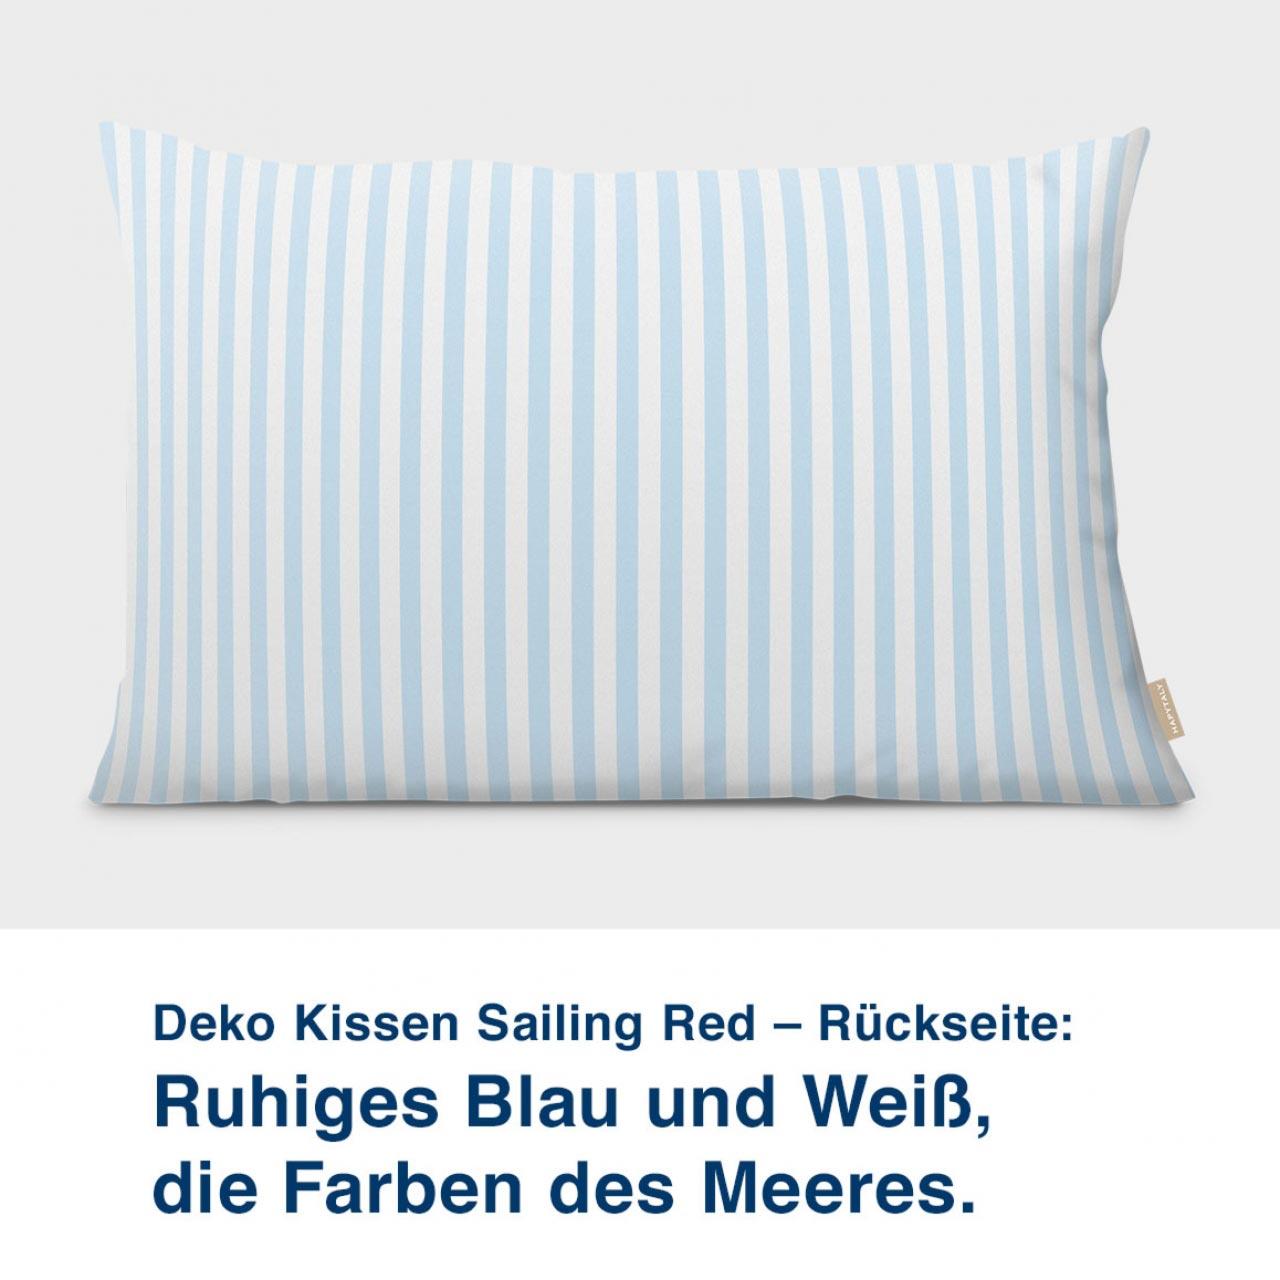 Kissen-Rückseite, maritimes Design mit Leuchtturm, Sailing Red 60 x40 cm